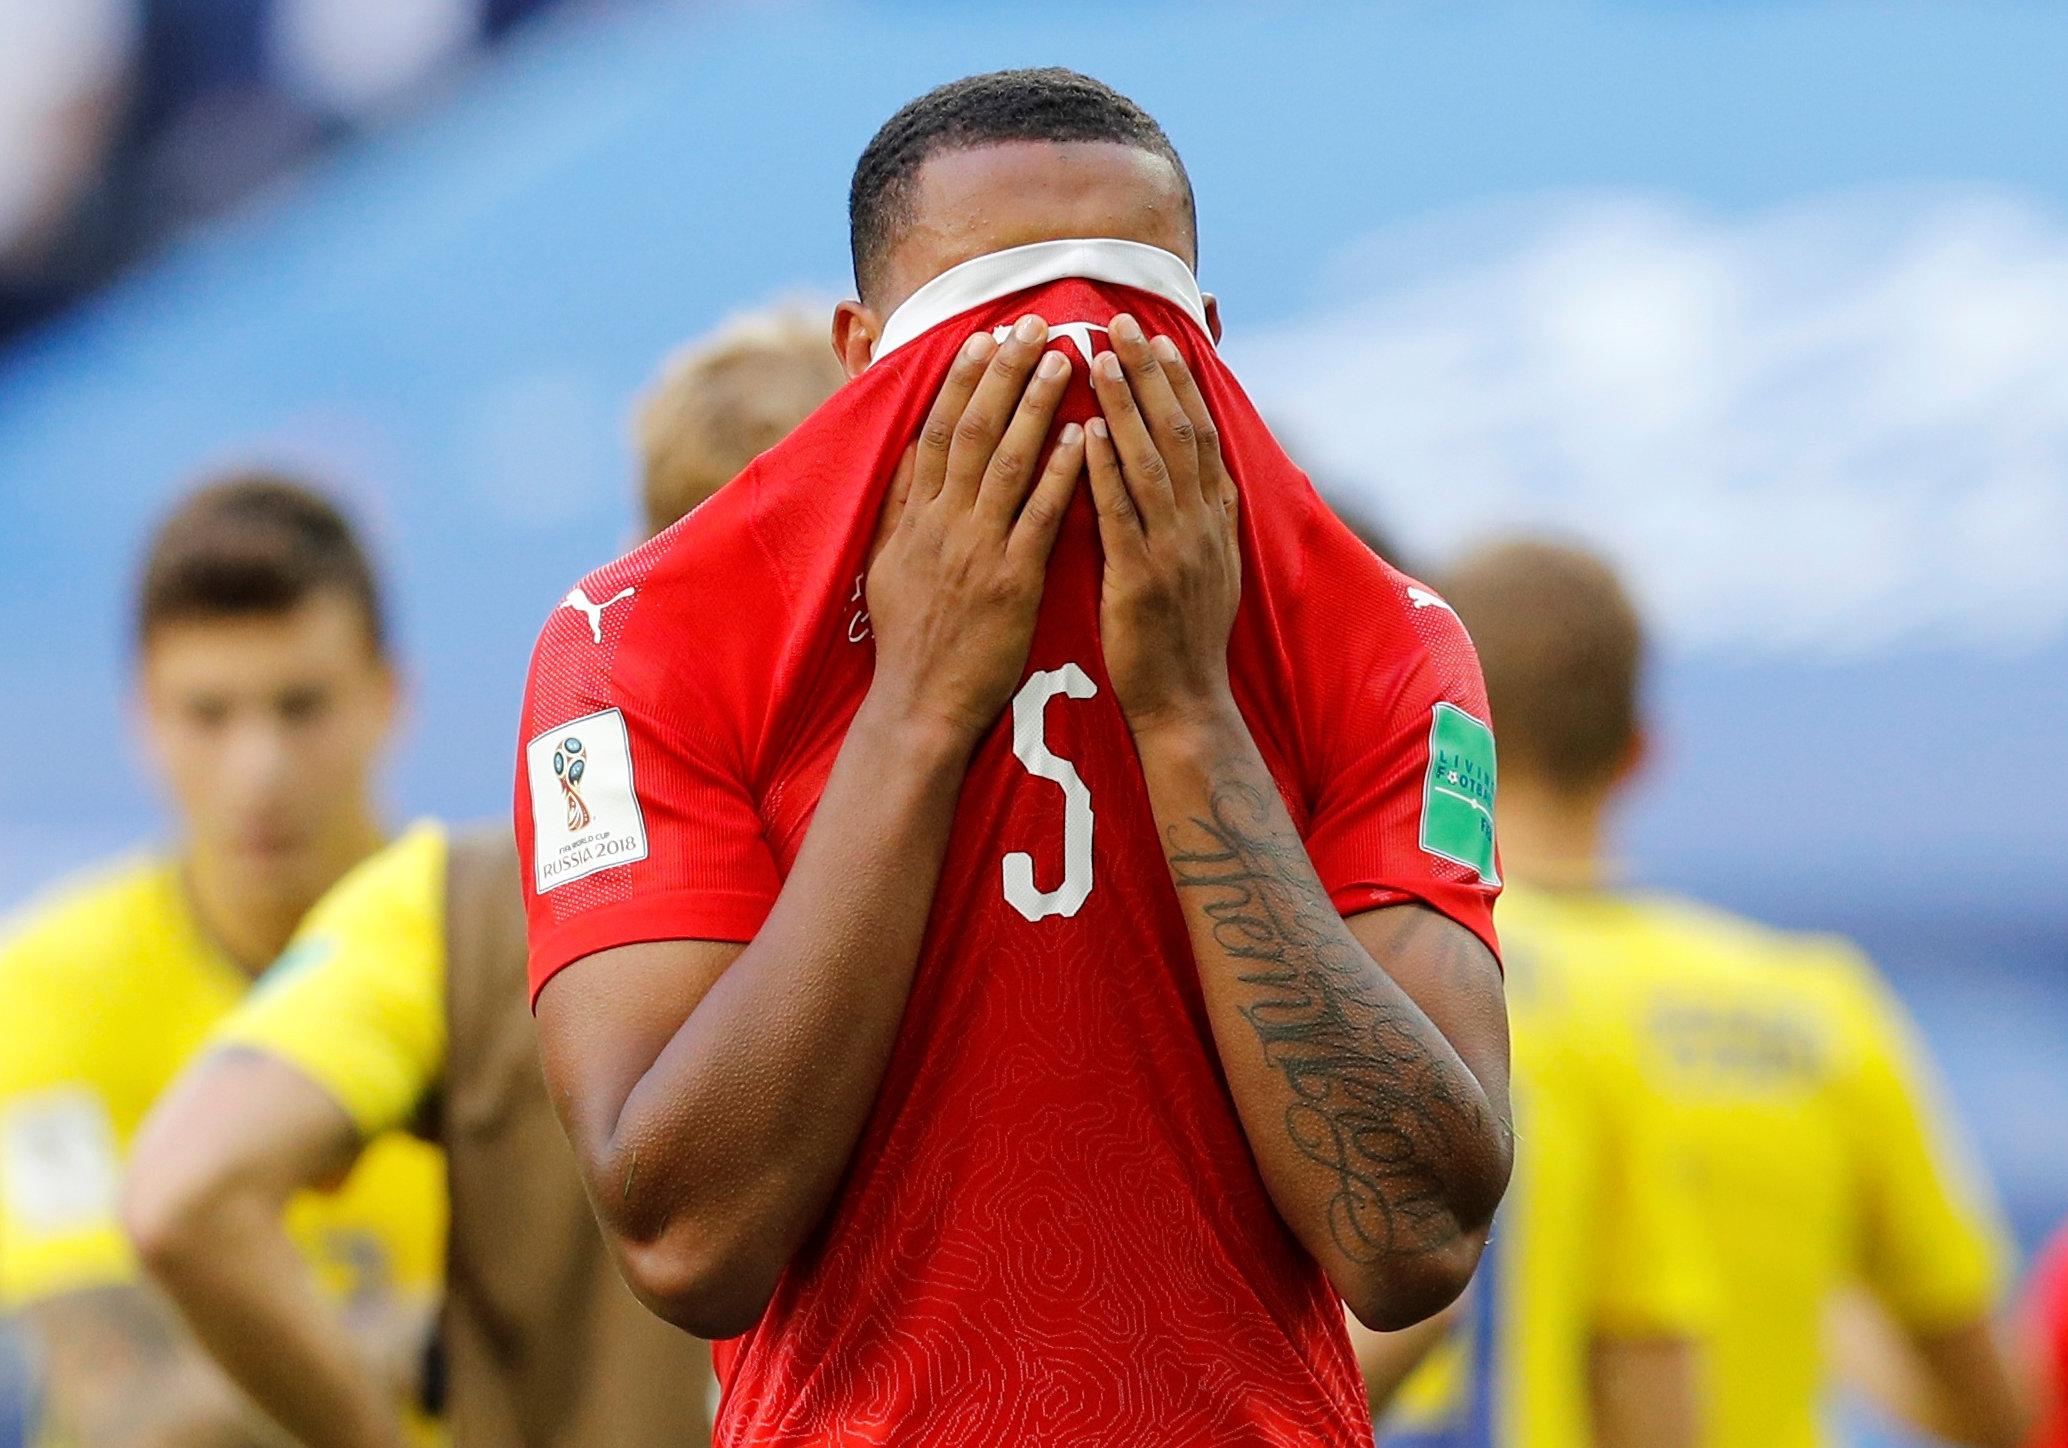 Soccer Football - World Cup - Round of 16 - Sweden vs Switzerland - Saint Petersburg Stadium, Saint Petersburg, Russia - July